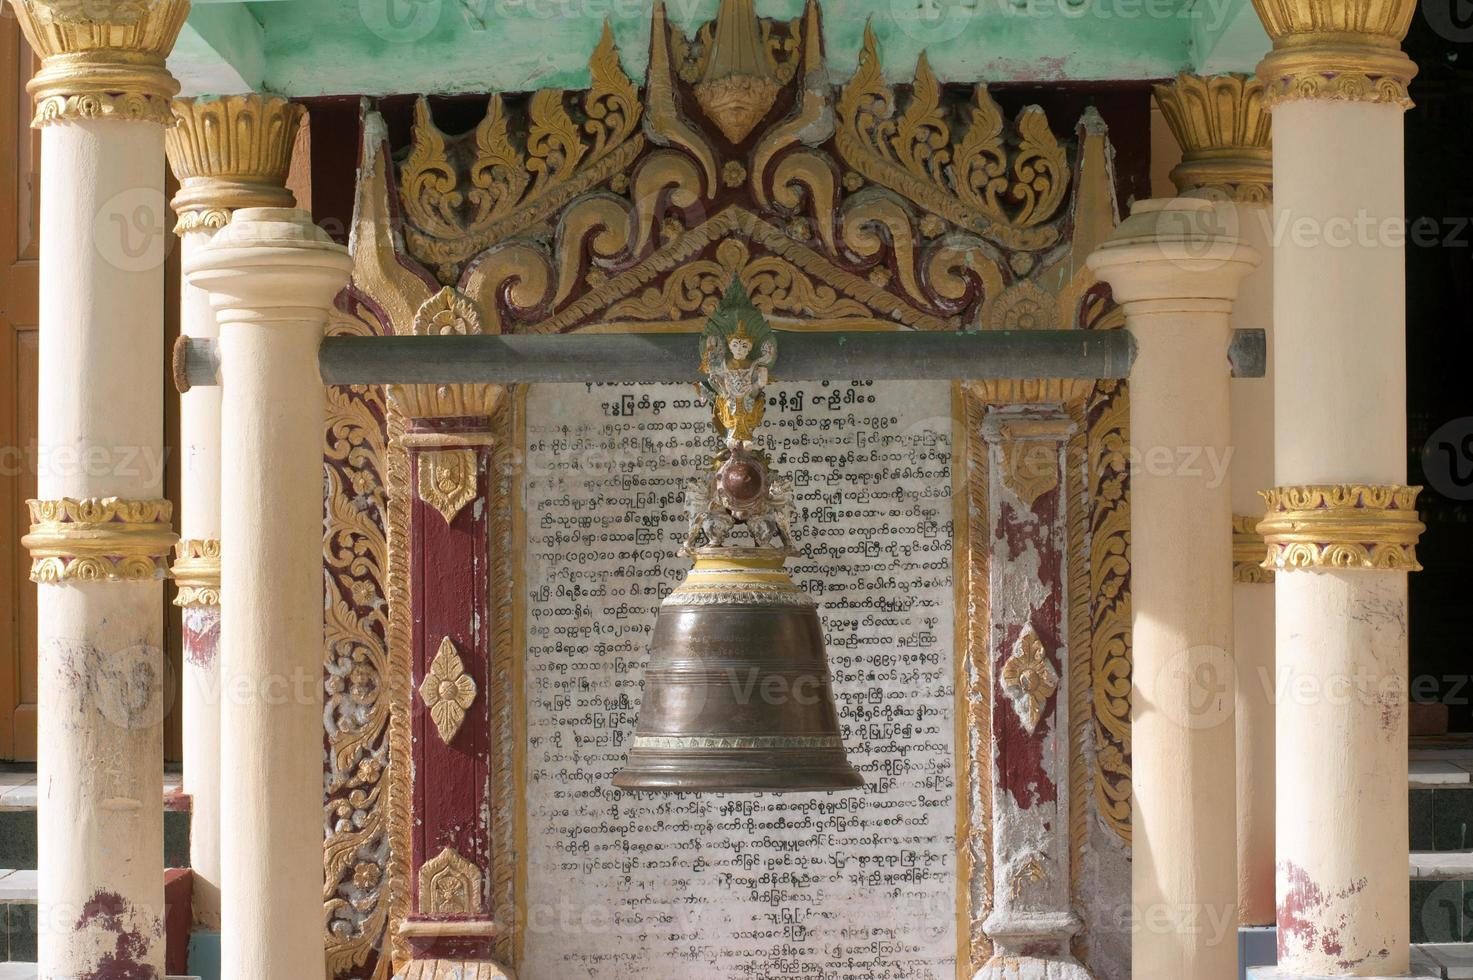 campana appesa. foto